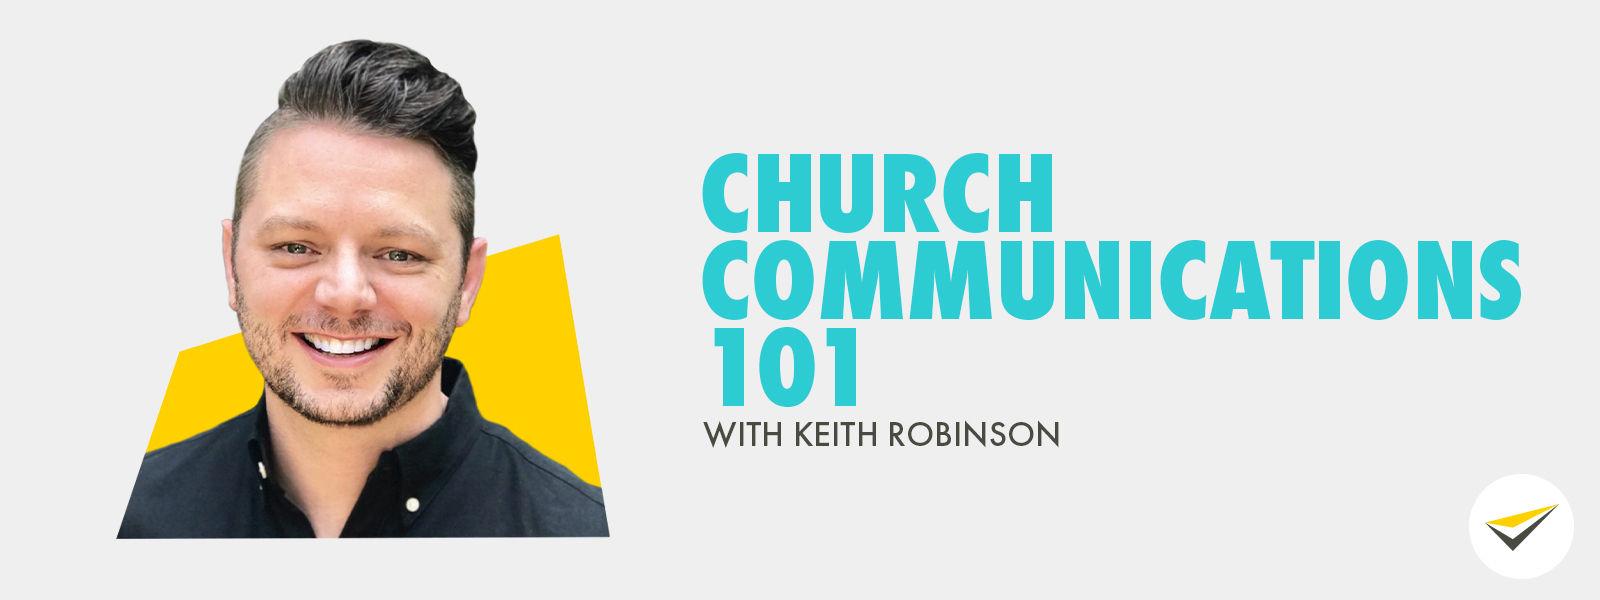 Church Communications 101